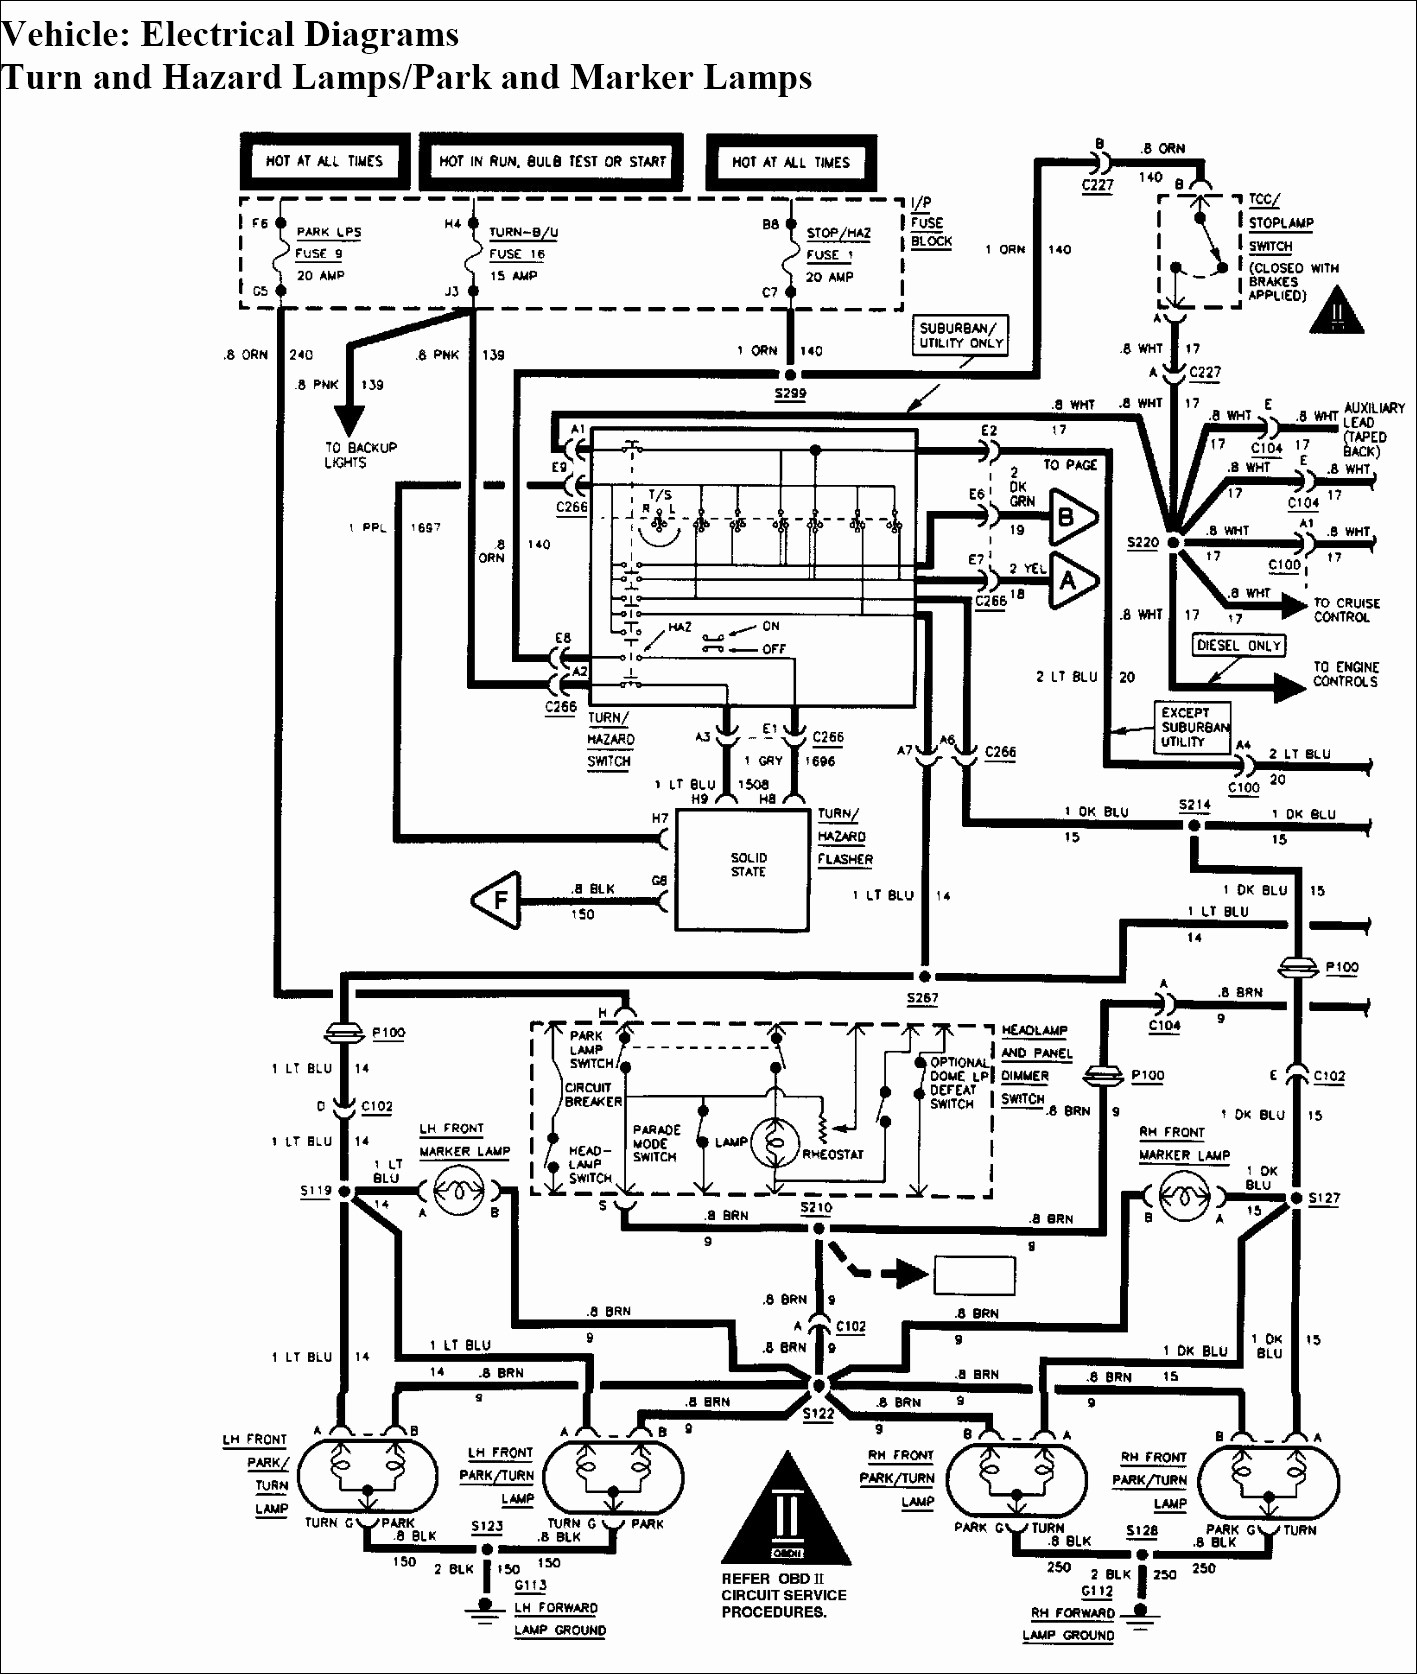 Wiring Diagram PDF: 152 Melex Golf Carts Wiring Diagram